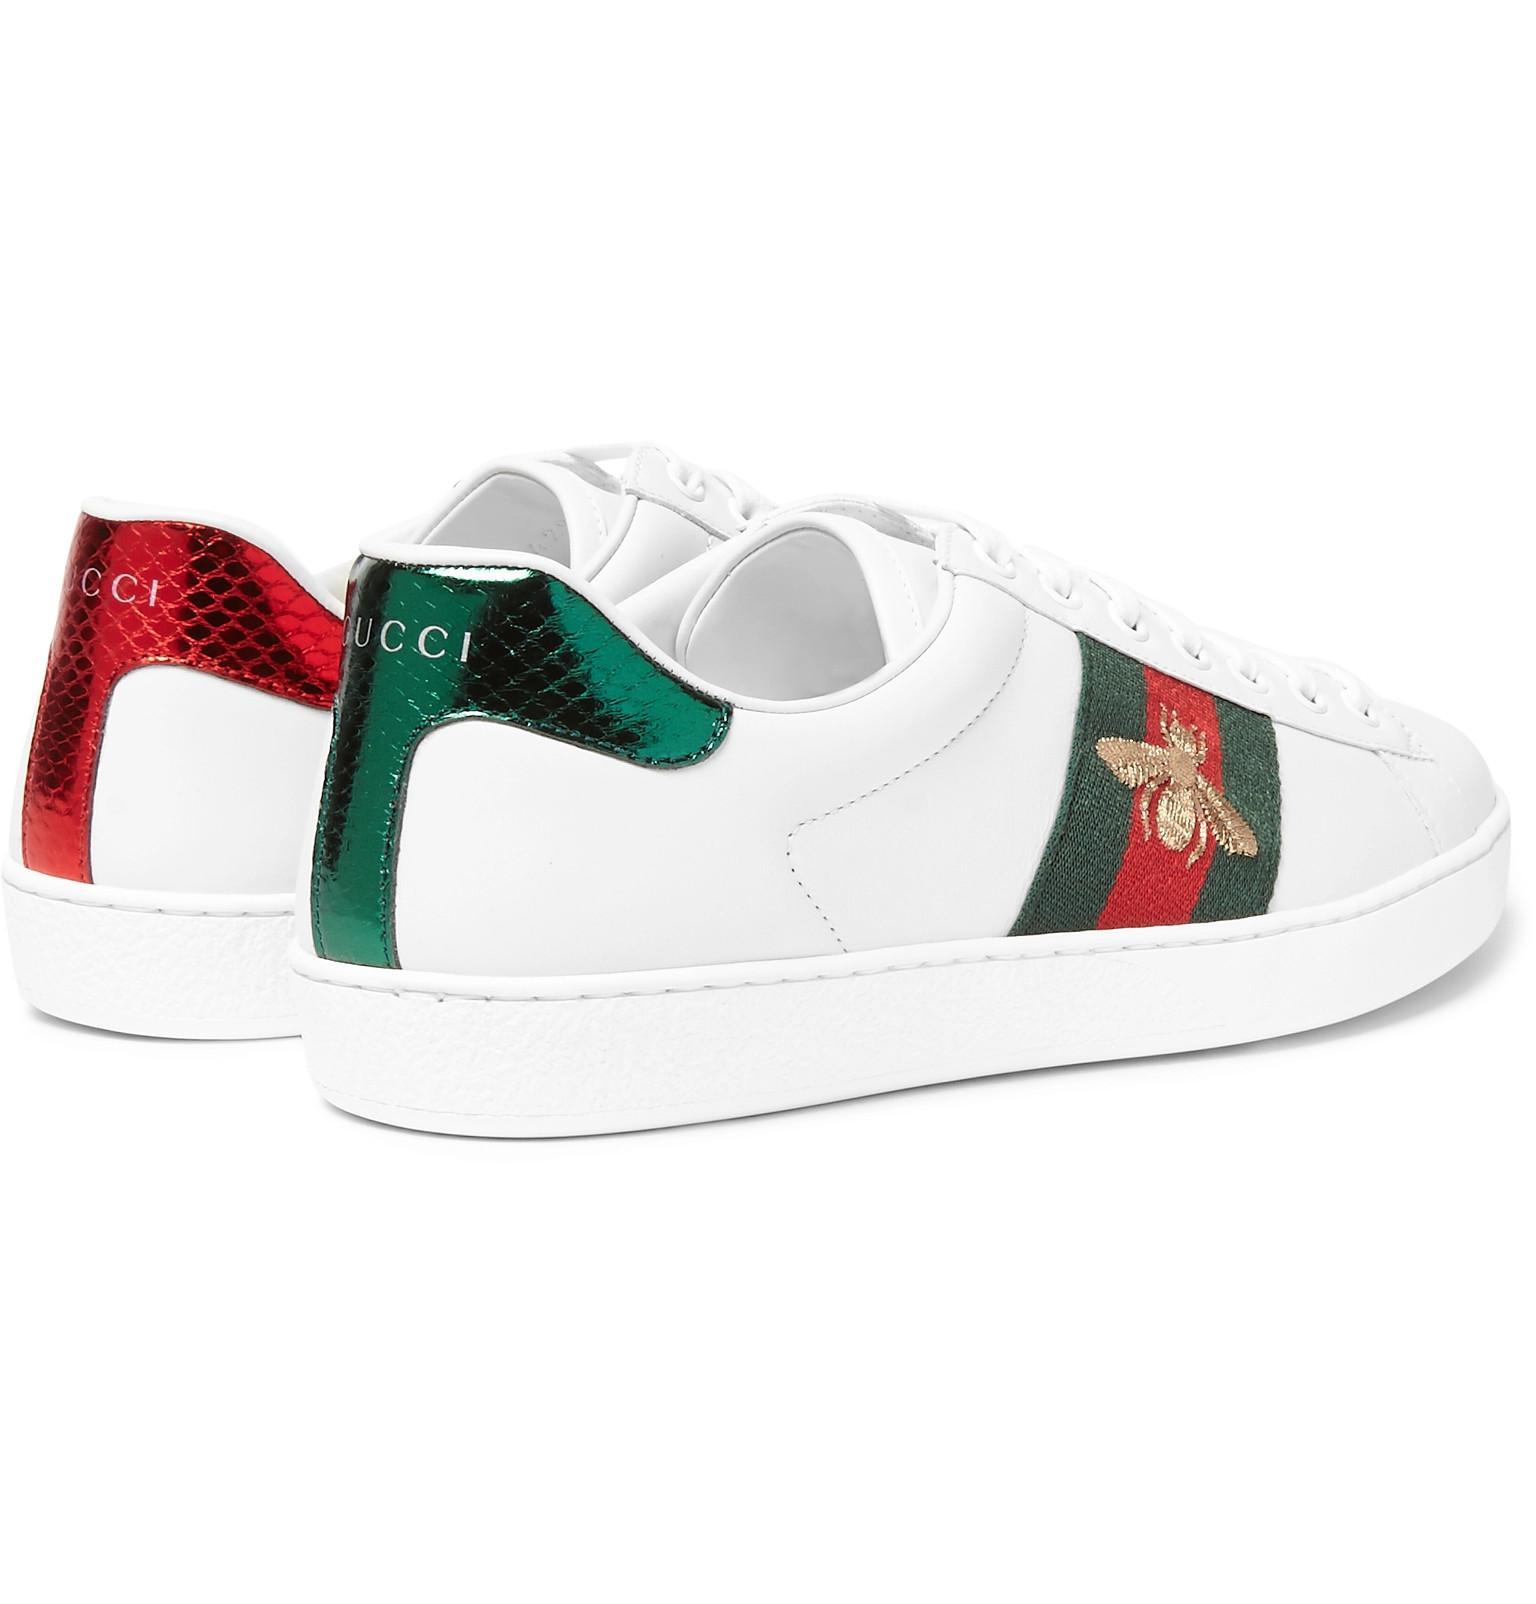 Mr Shoes Australia